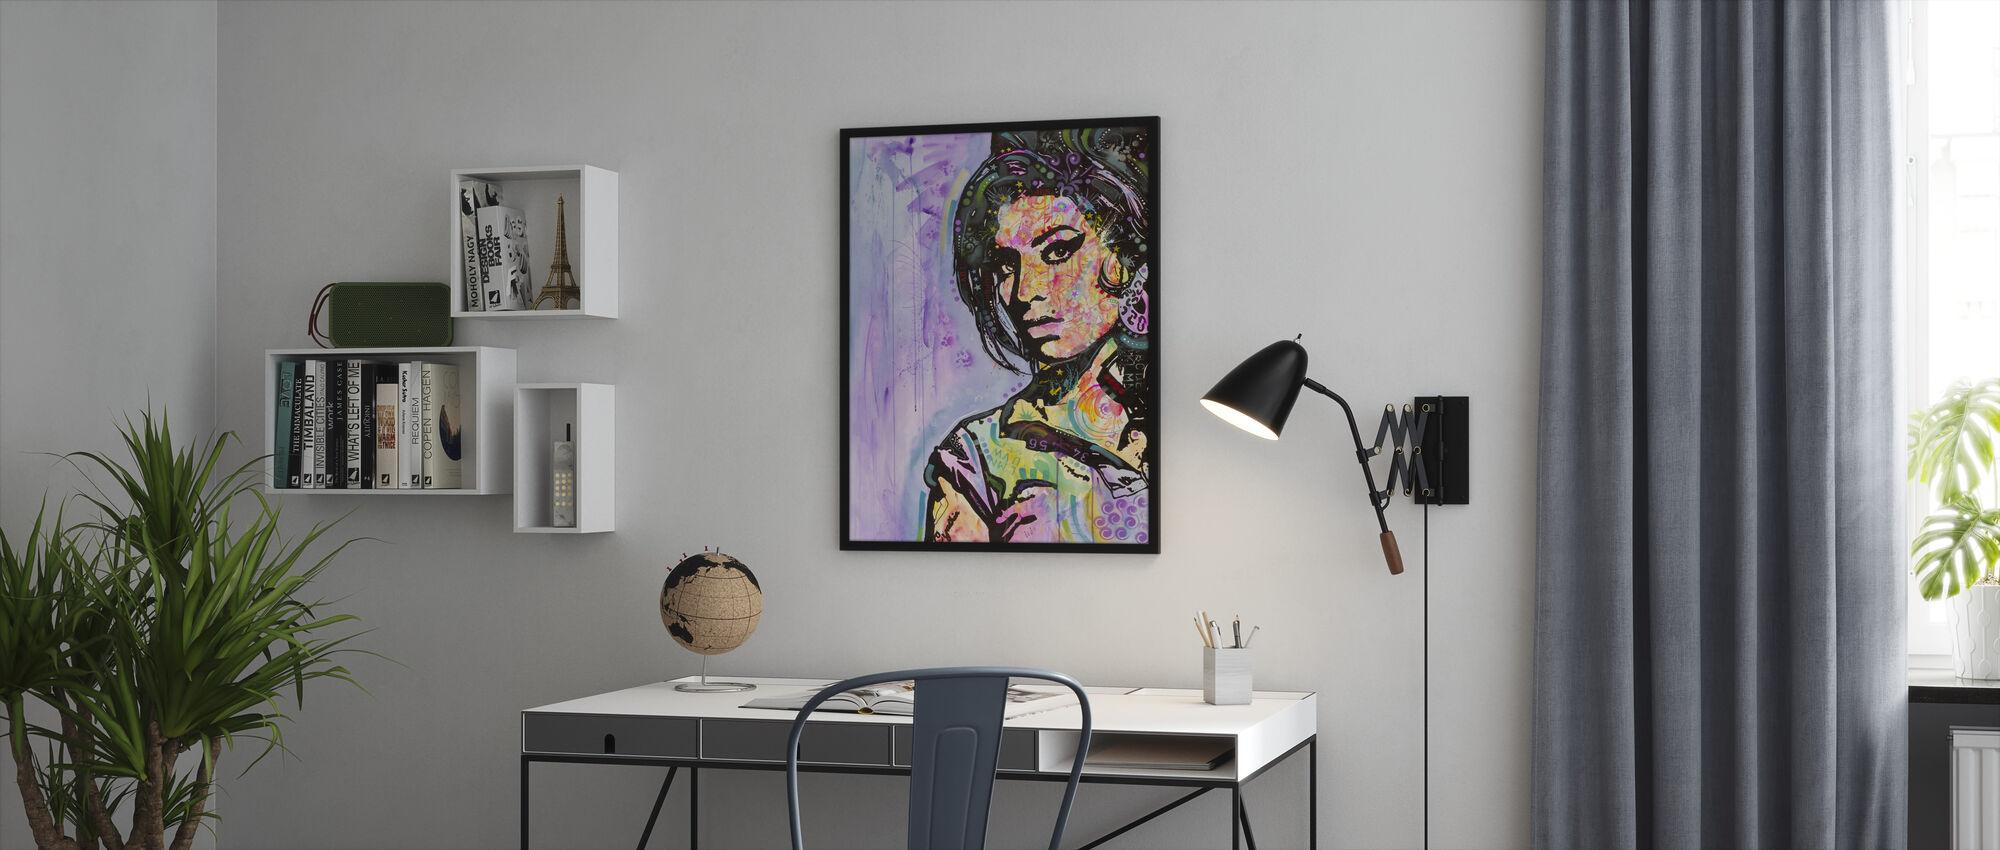 Amy - Framed print - Office